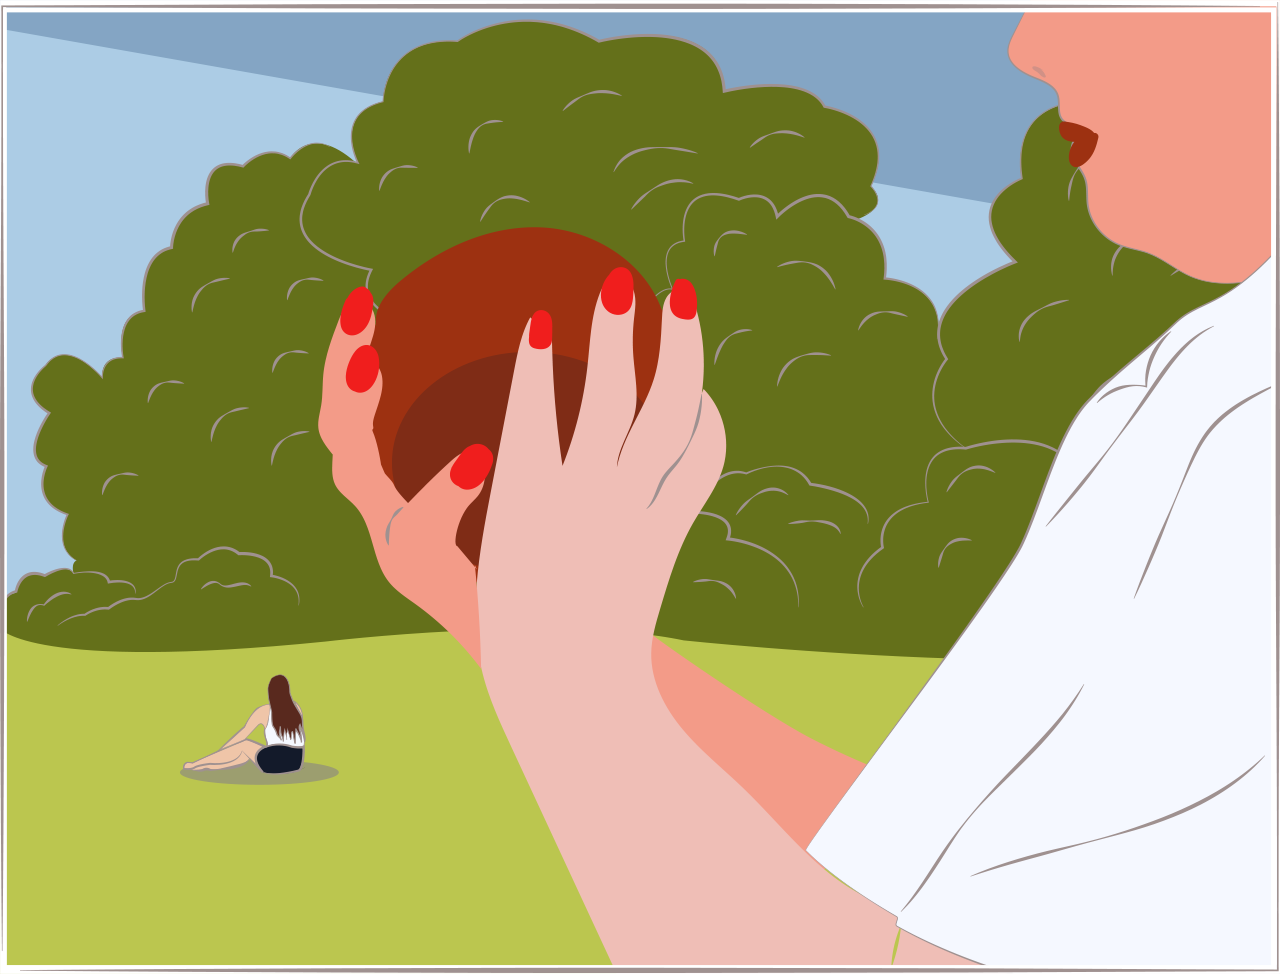 Illustration of a female bowler